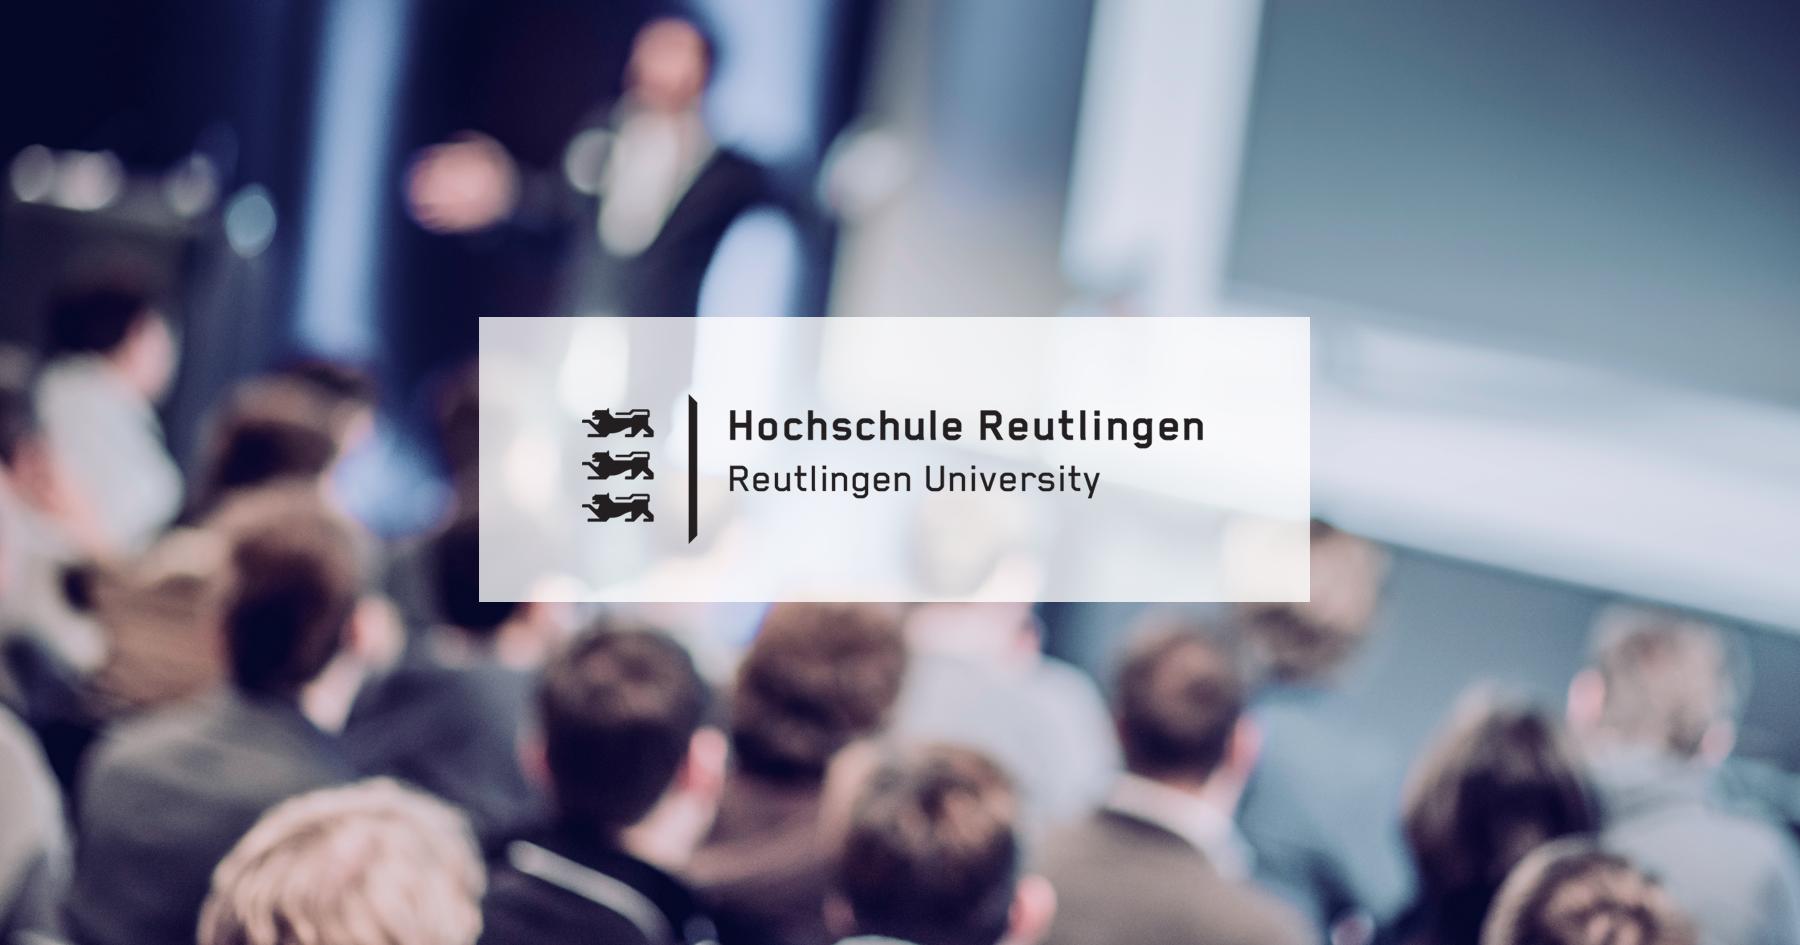 SE_uutiskuva_Reutlingen_v01